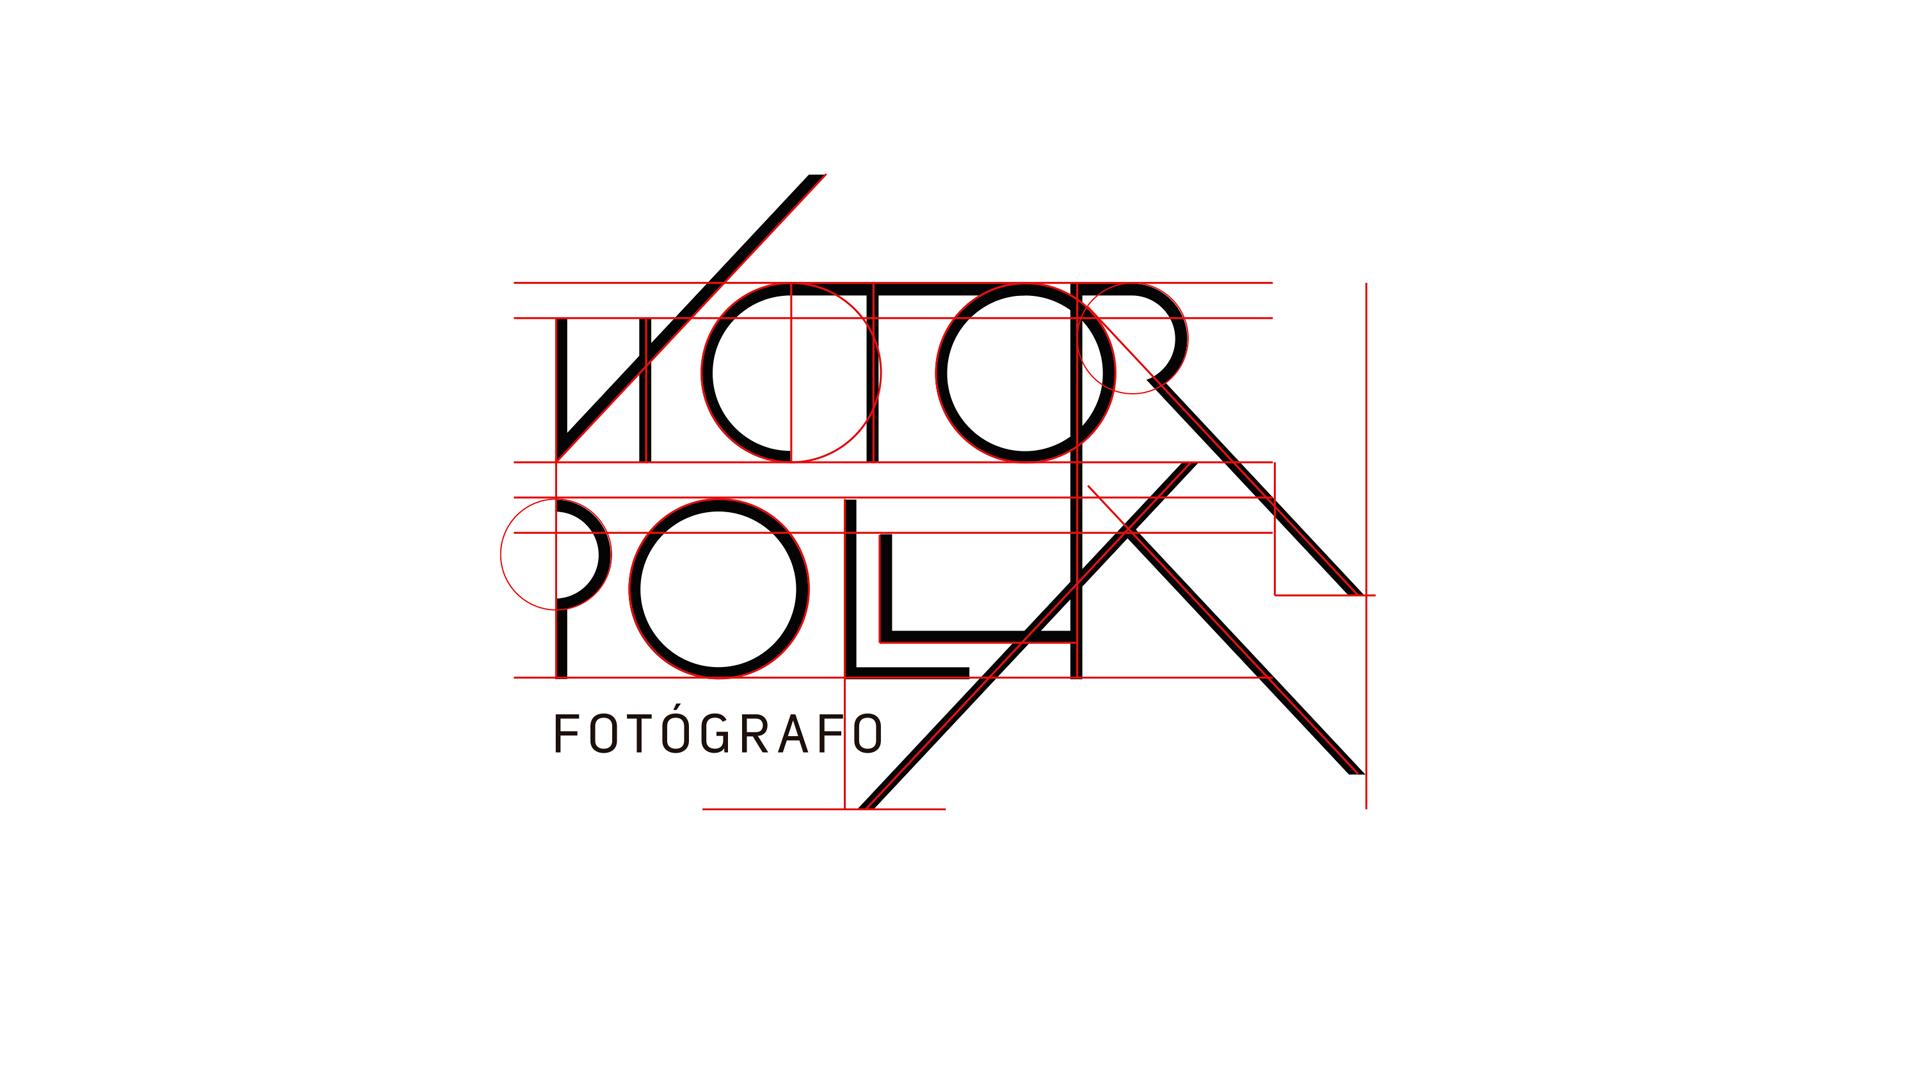 victor-pollak-logo-grade.png